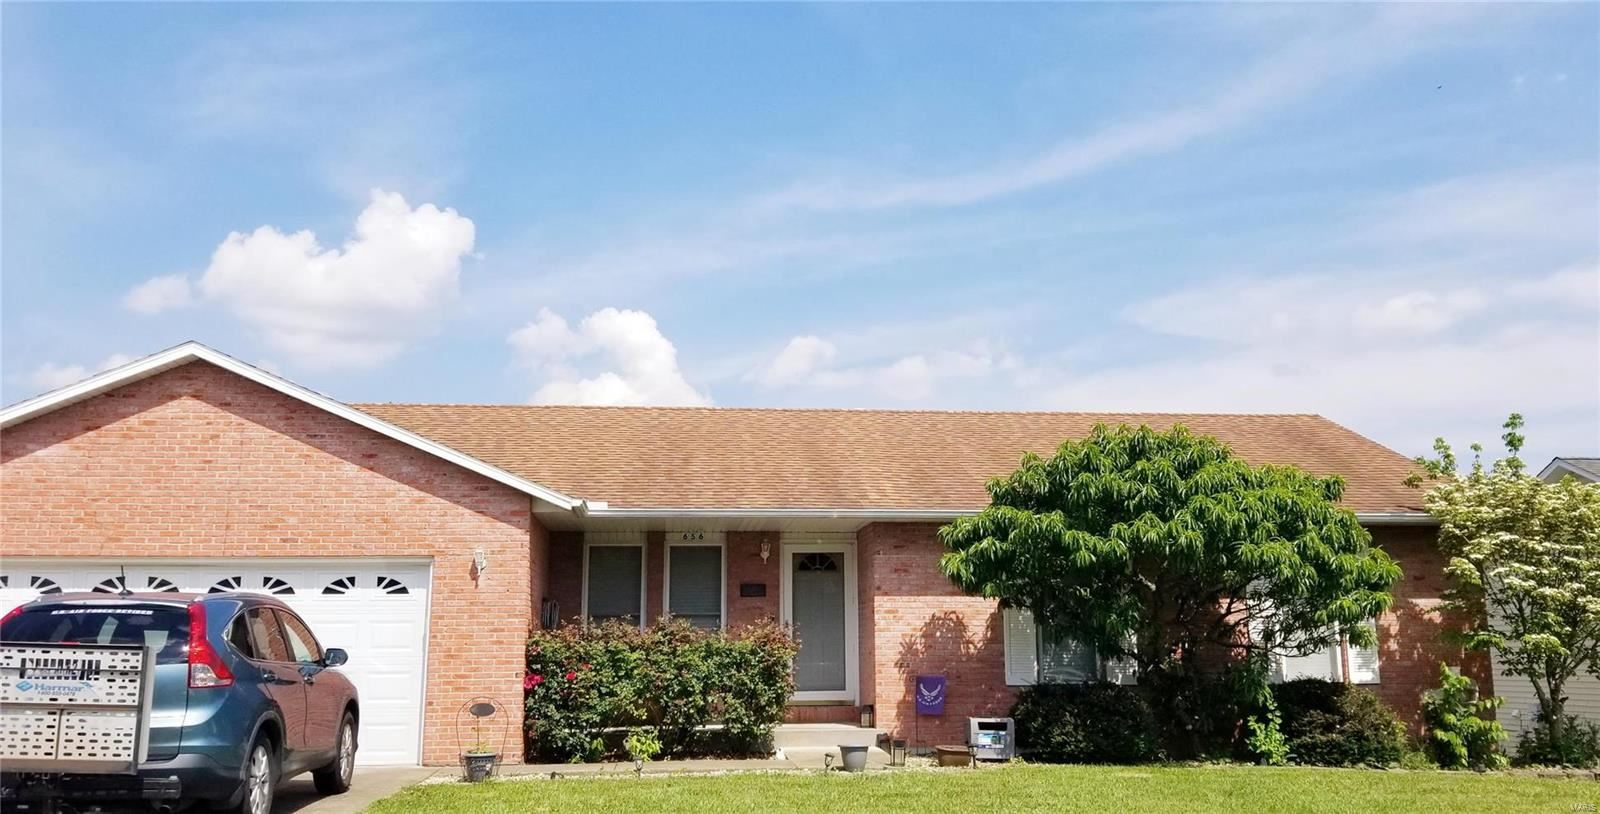 Photo of 656 Bunker Drive, Jackson, MO 63755 (MLS # 21026696)